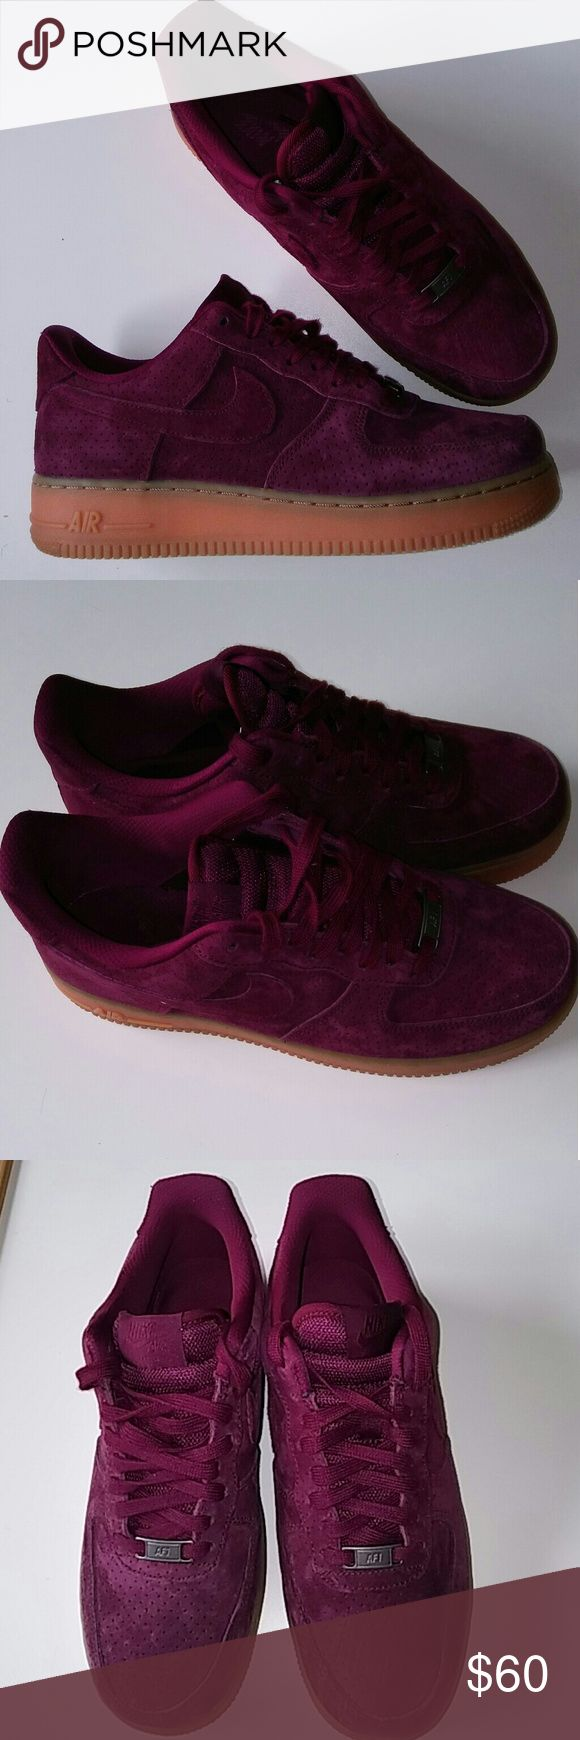 Air Force One Burgundy Suede Air Force One Burgundy Suede Sneaker Nike Shoes Sneakers